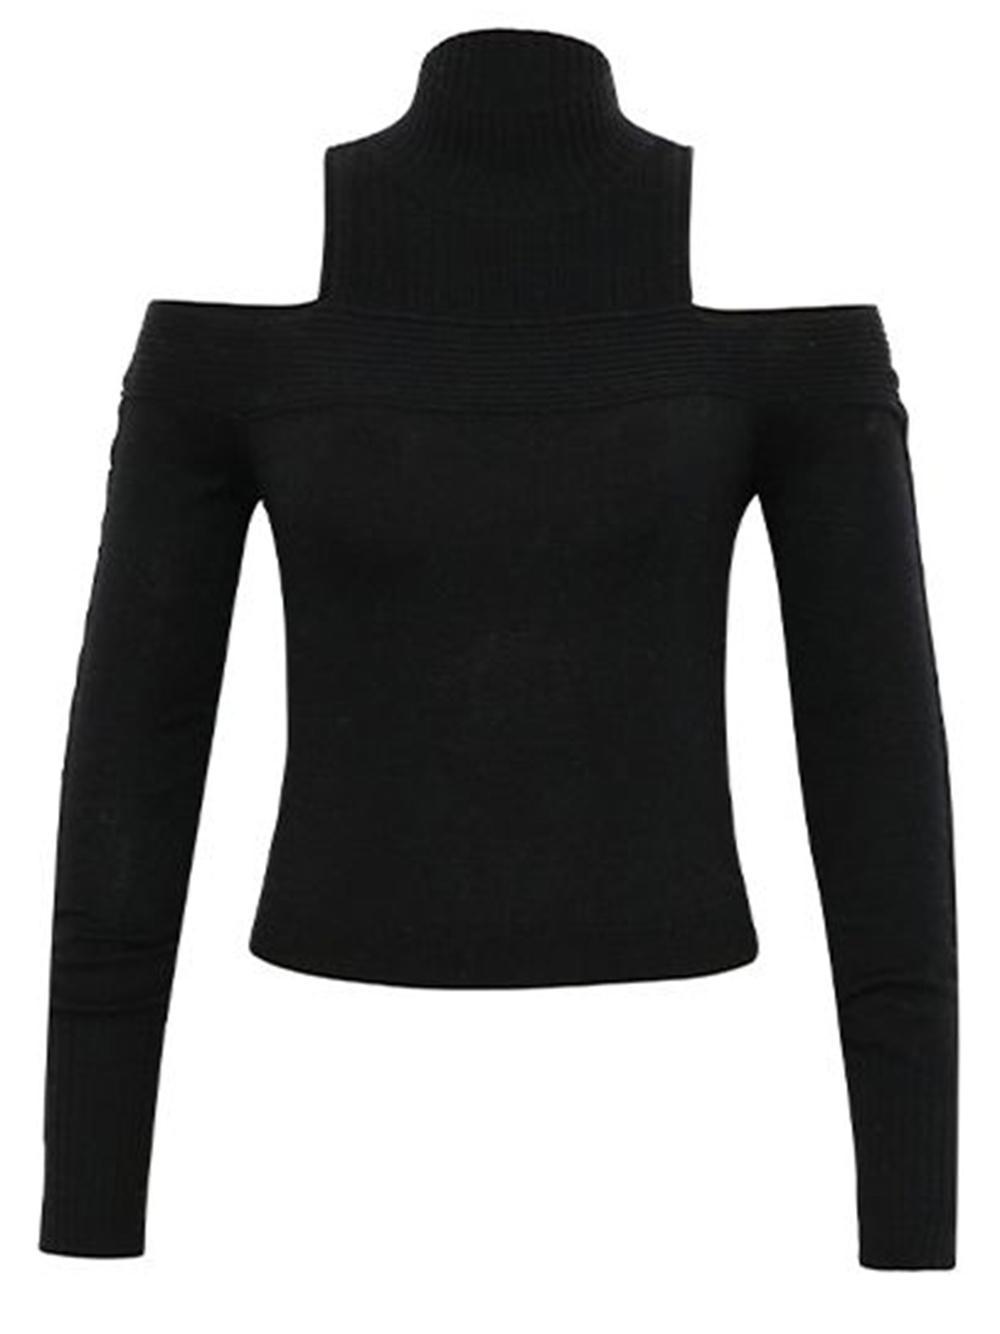 Gillian Loungewear Off Shoulder Knit Top